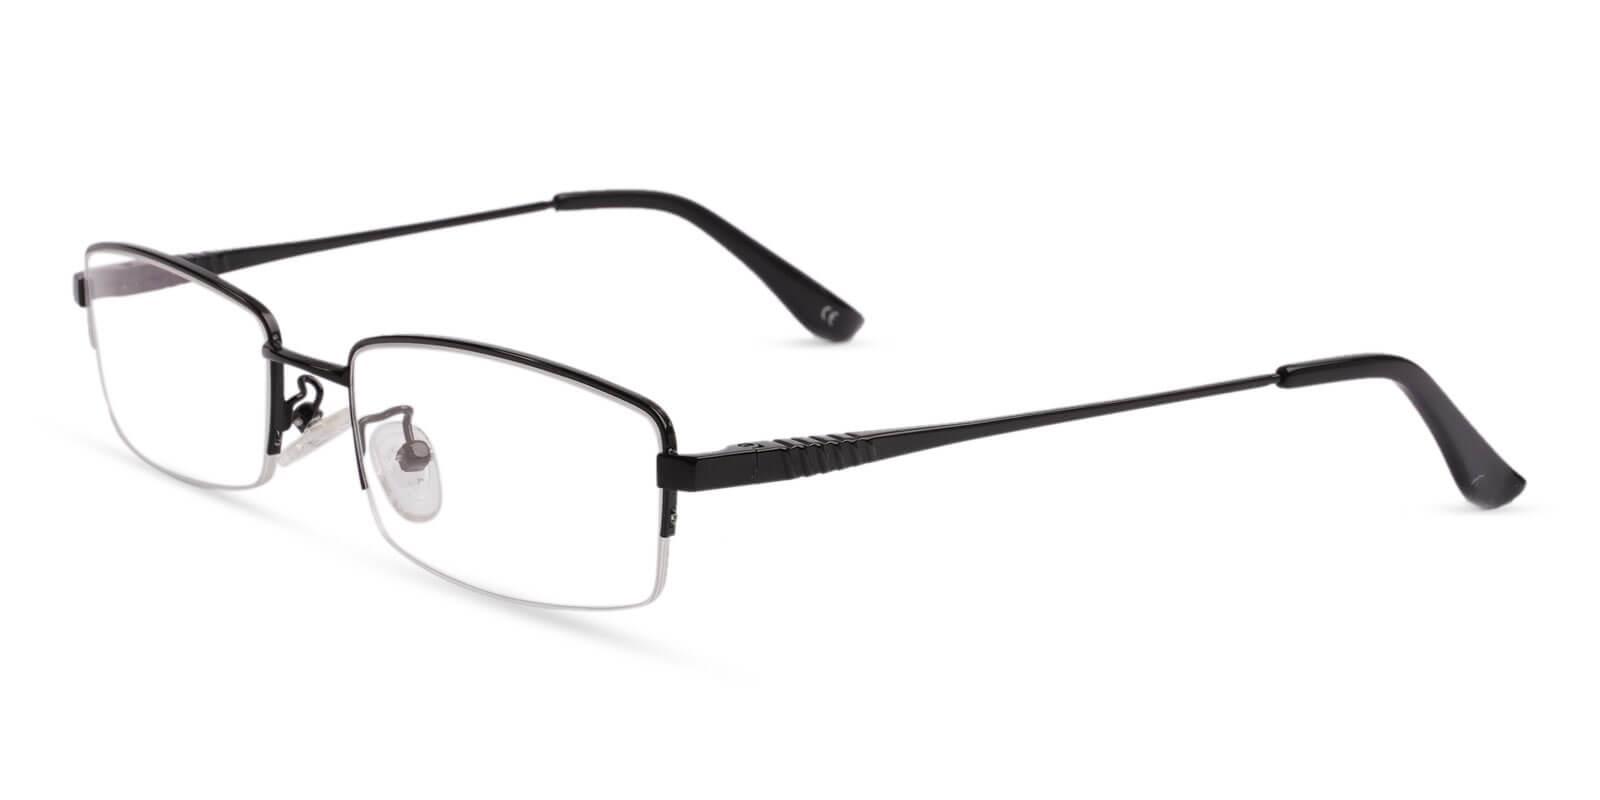 Grayson Black Metal Eyeglasses , NosePads , SpringHinges Frames from ABBE Glasses